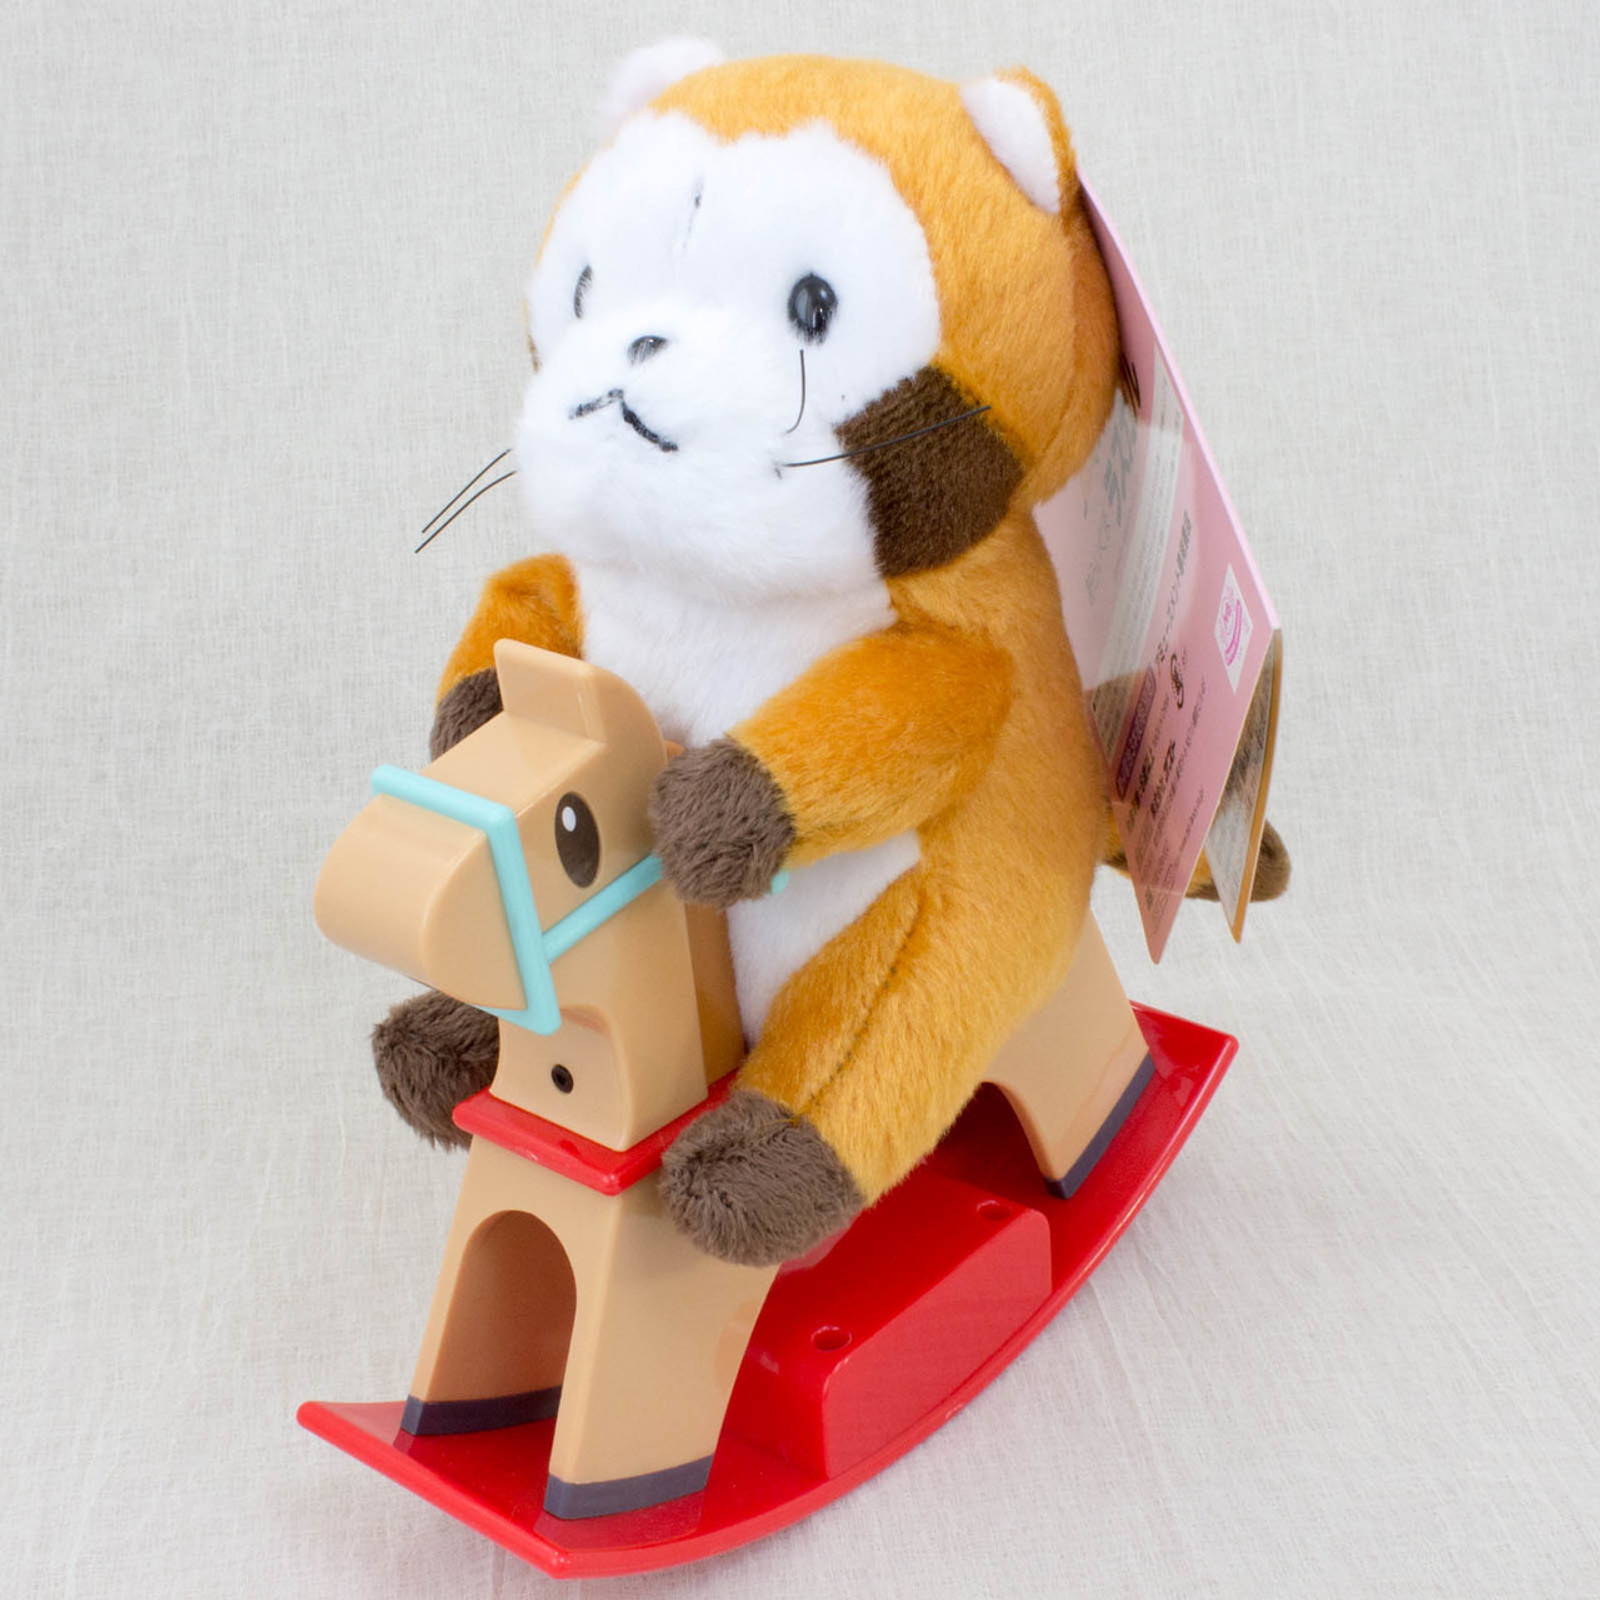 Rascal the Raccoon Light Sensor Whining & Rockig Rascal Figure JAPAN ANIME MANGA